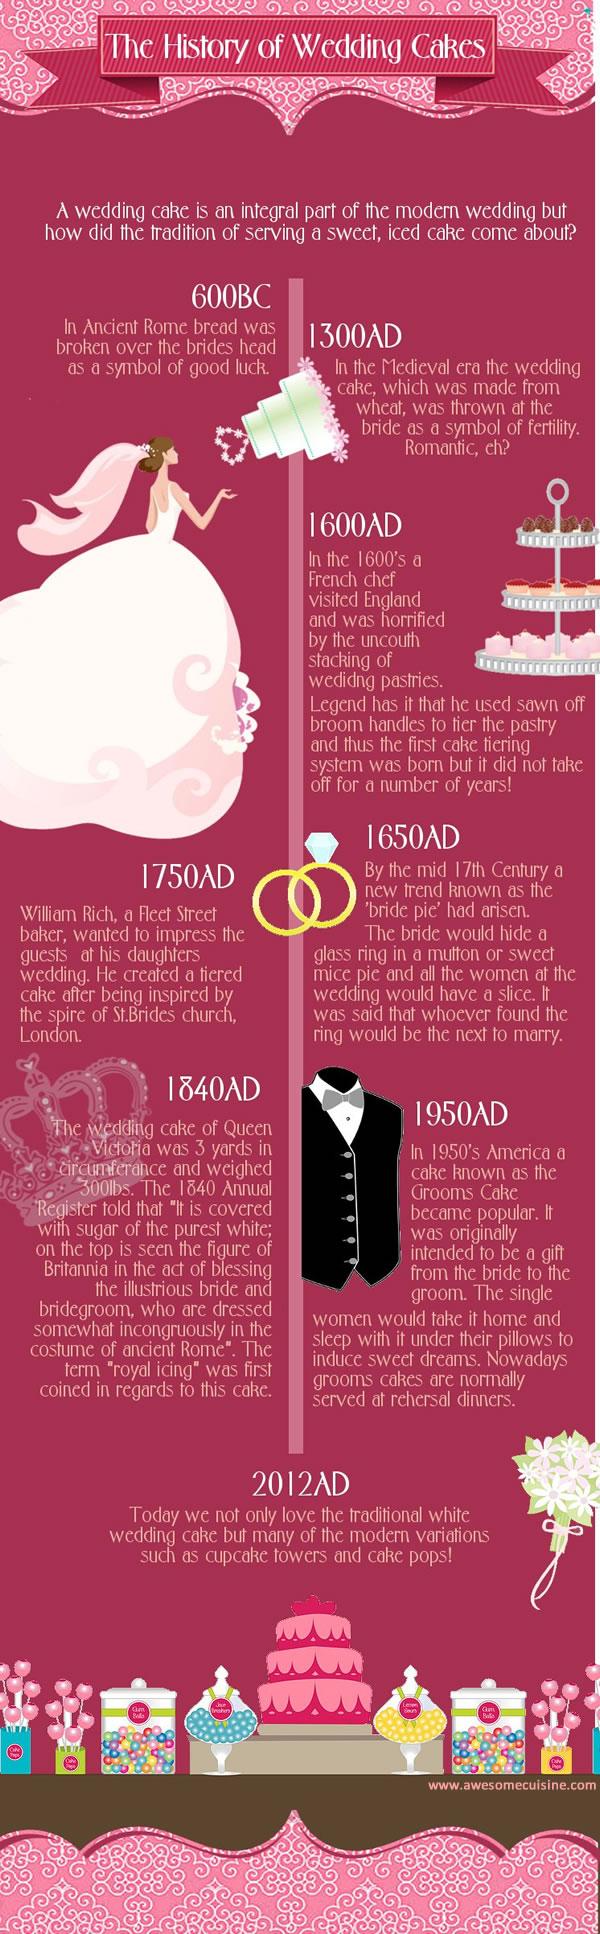 History of Wedding Cakes